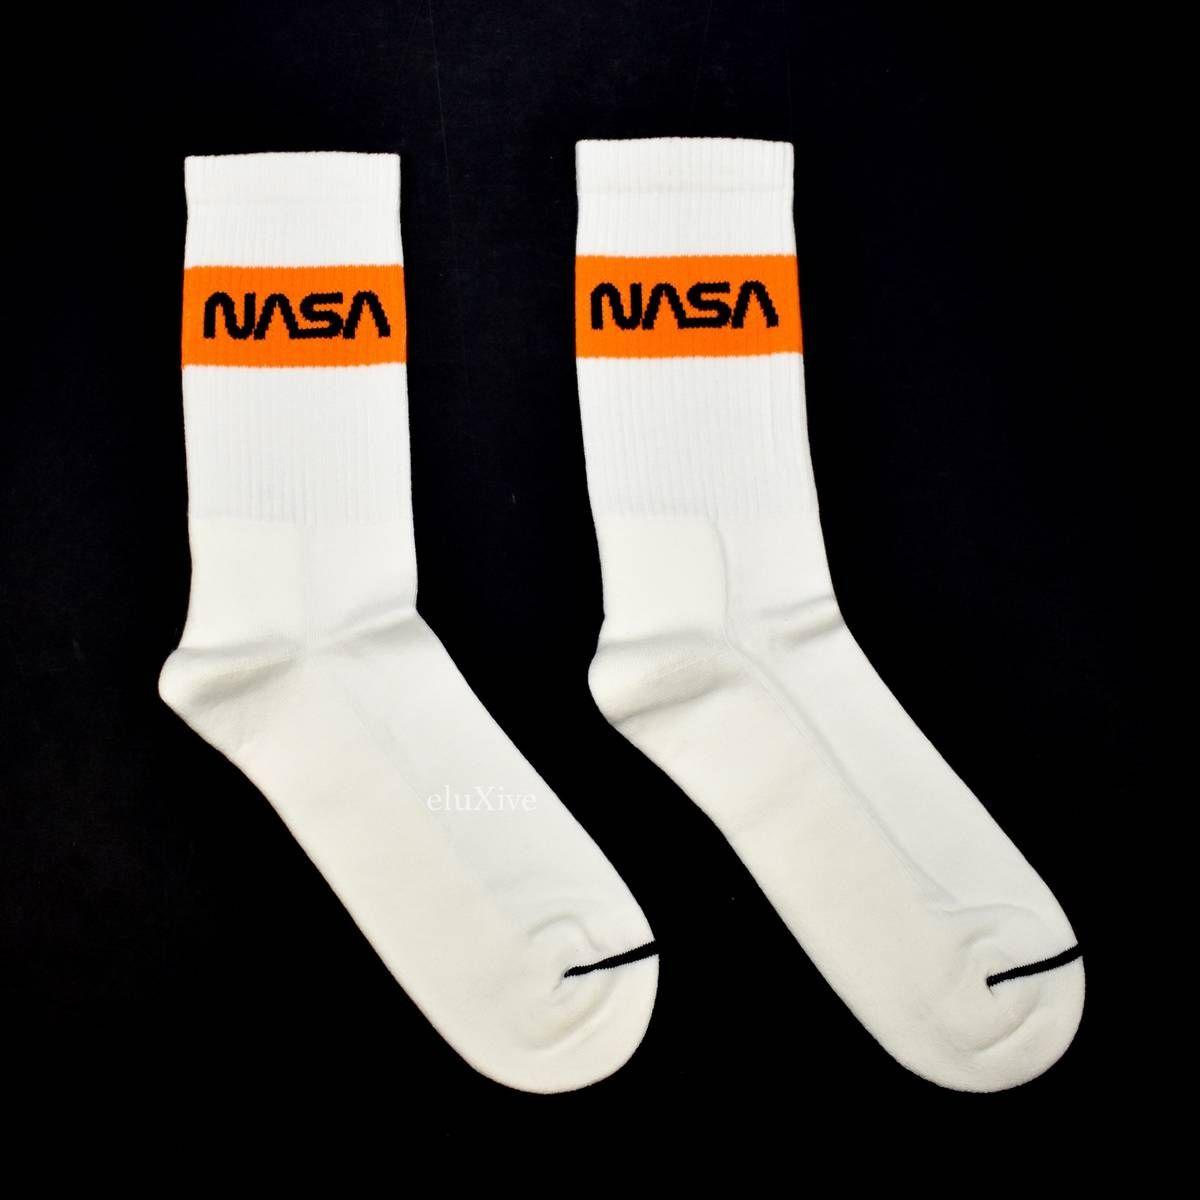 8f6a866b5b30 Heron Preston NASA Logo Knit Socks White DS Size one size - Socks    Underwear for Sale - Grailed